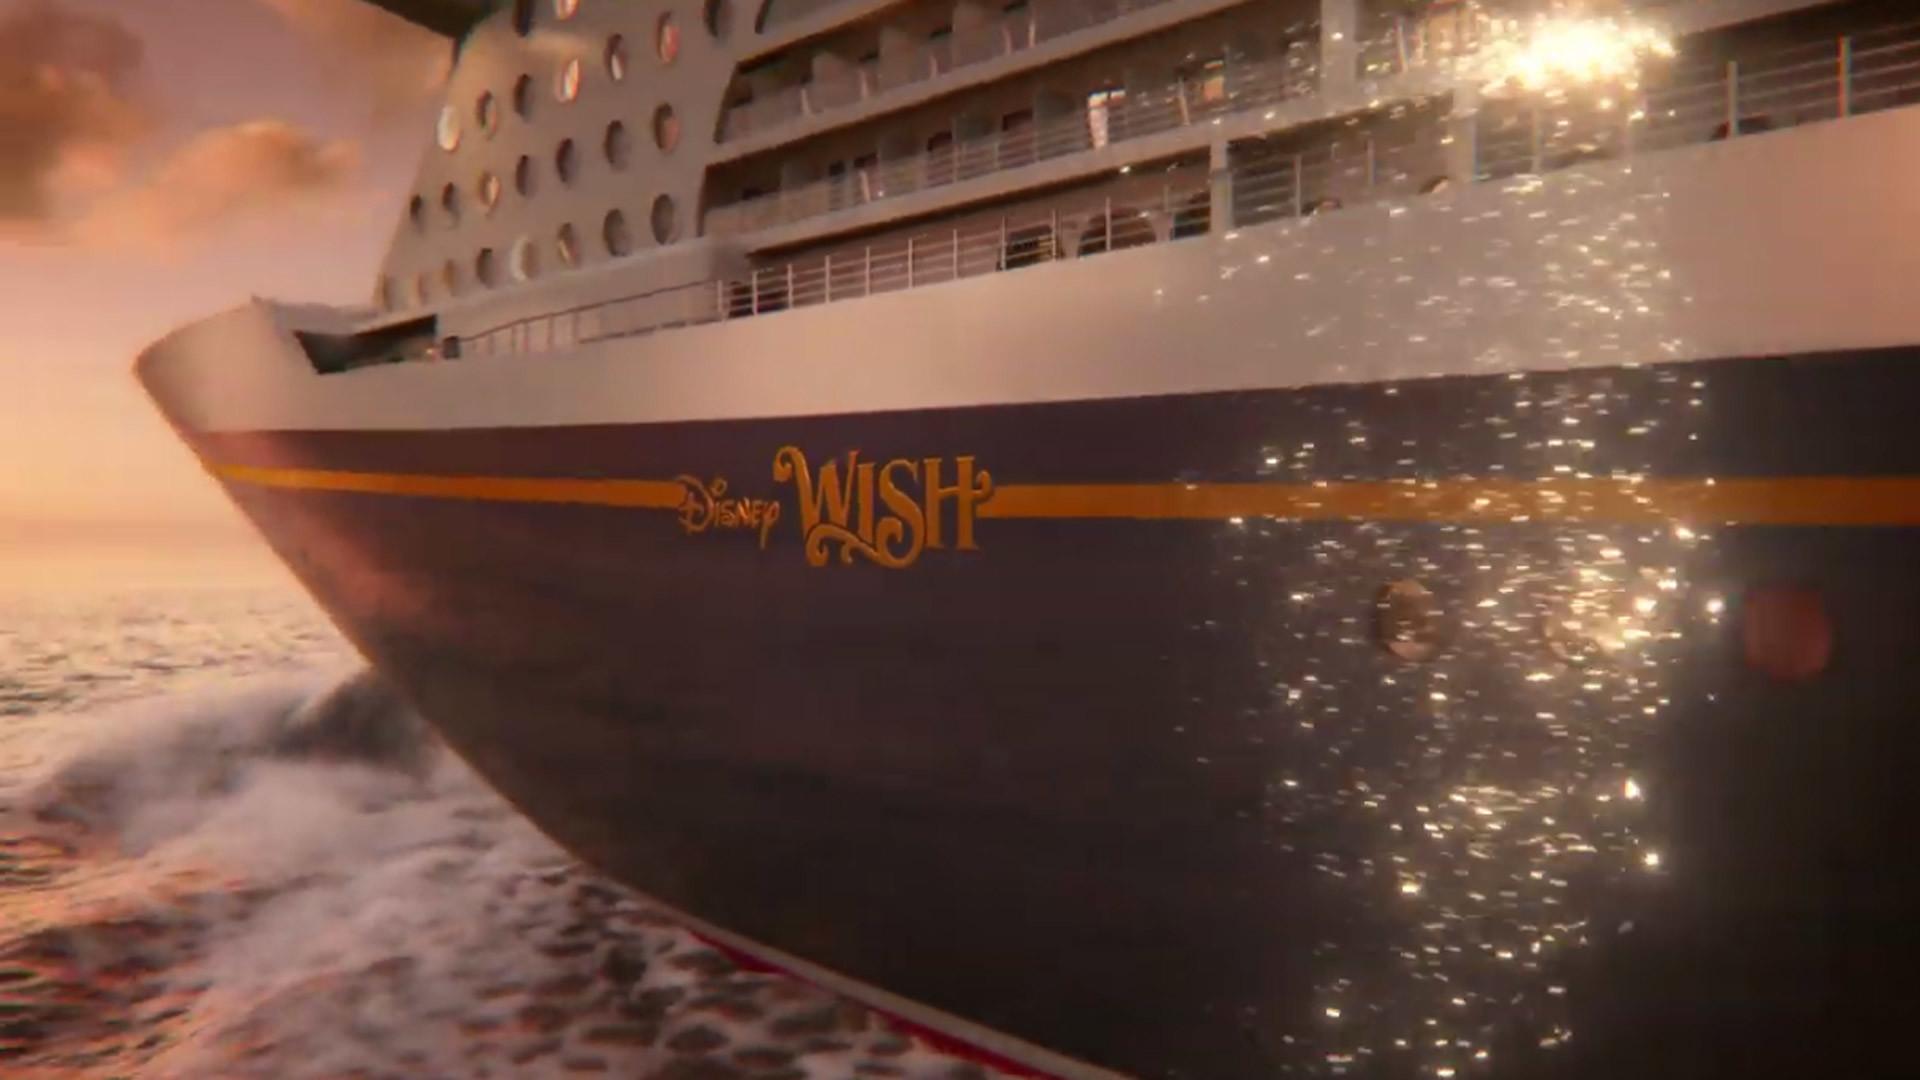 First Look At Disney Wish Cruise Ship Orlando Sentinel